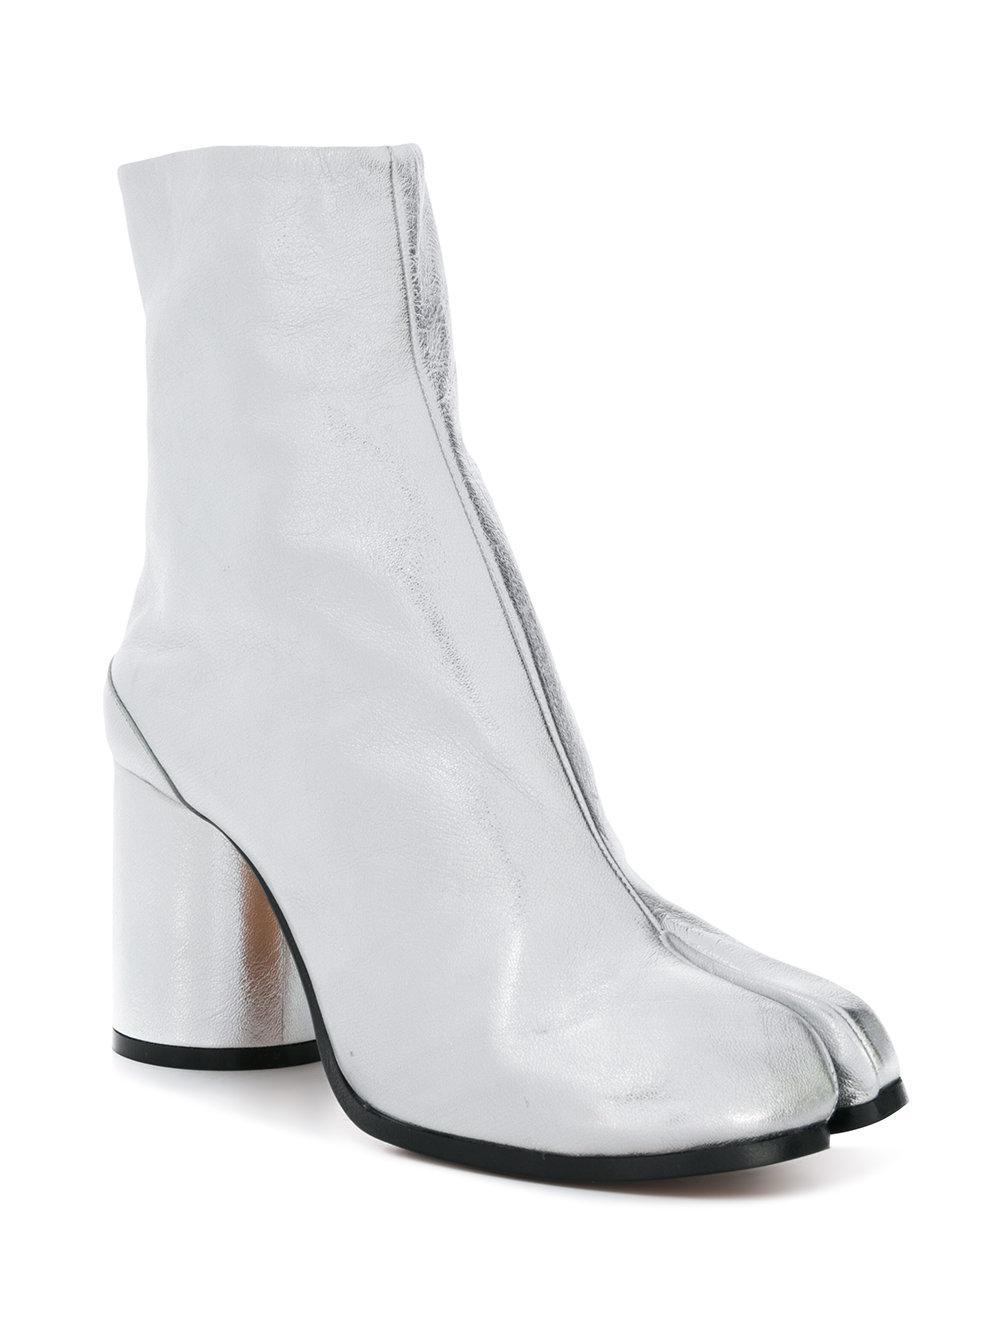 04f213b1a71 Lyst - Maison Margiela Laminated Tabi Boots in Metallic